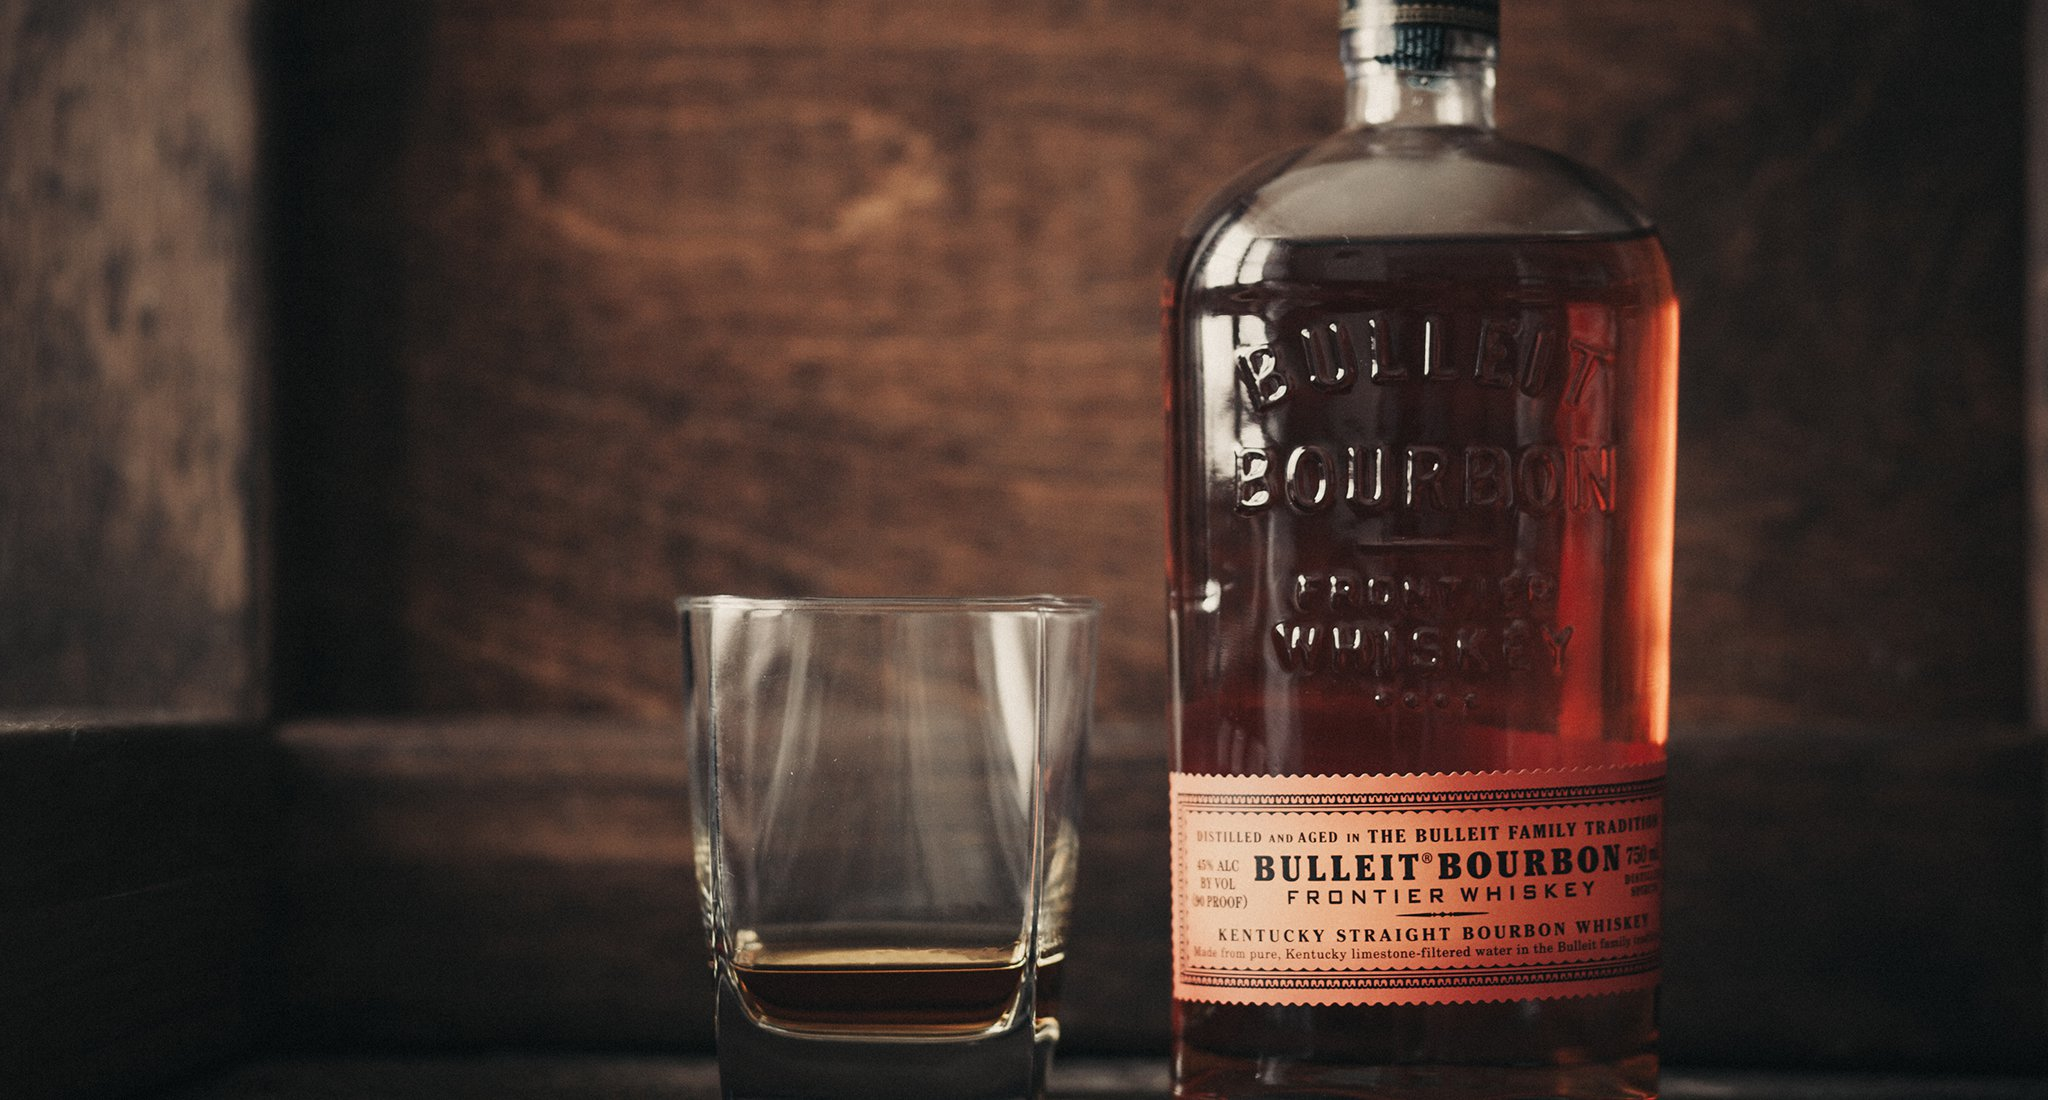 Bulleit Bourbon Dinner - Bulleit Bourbon Dinner